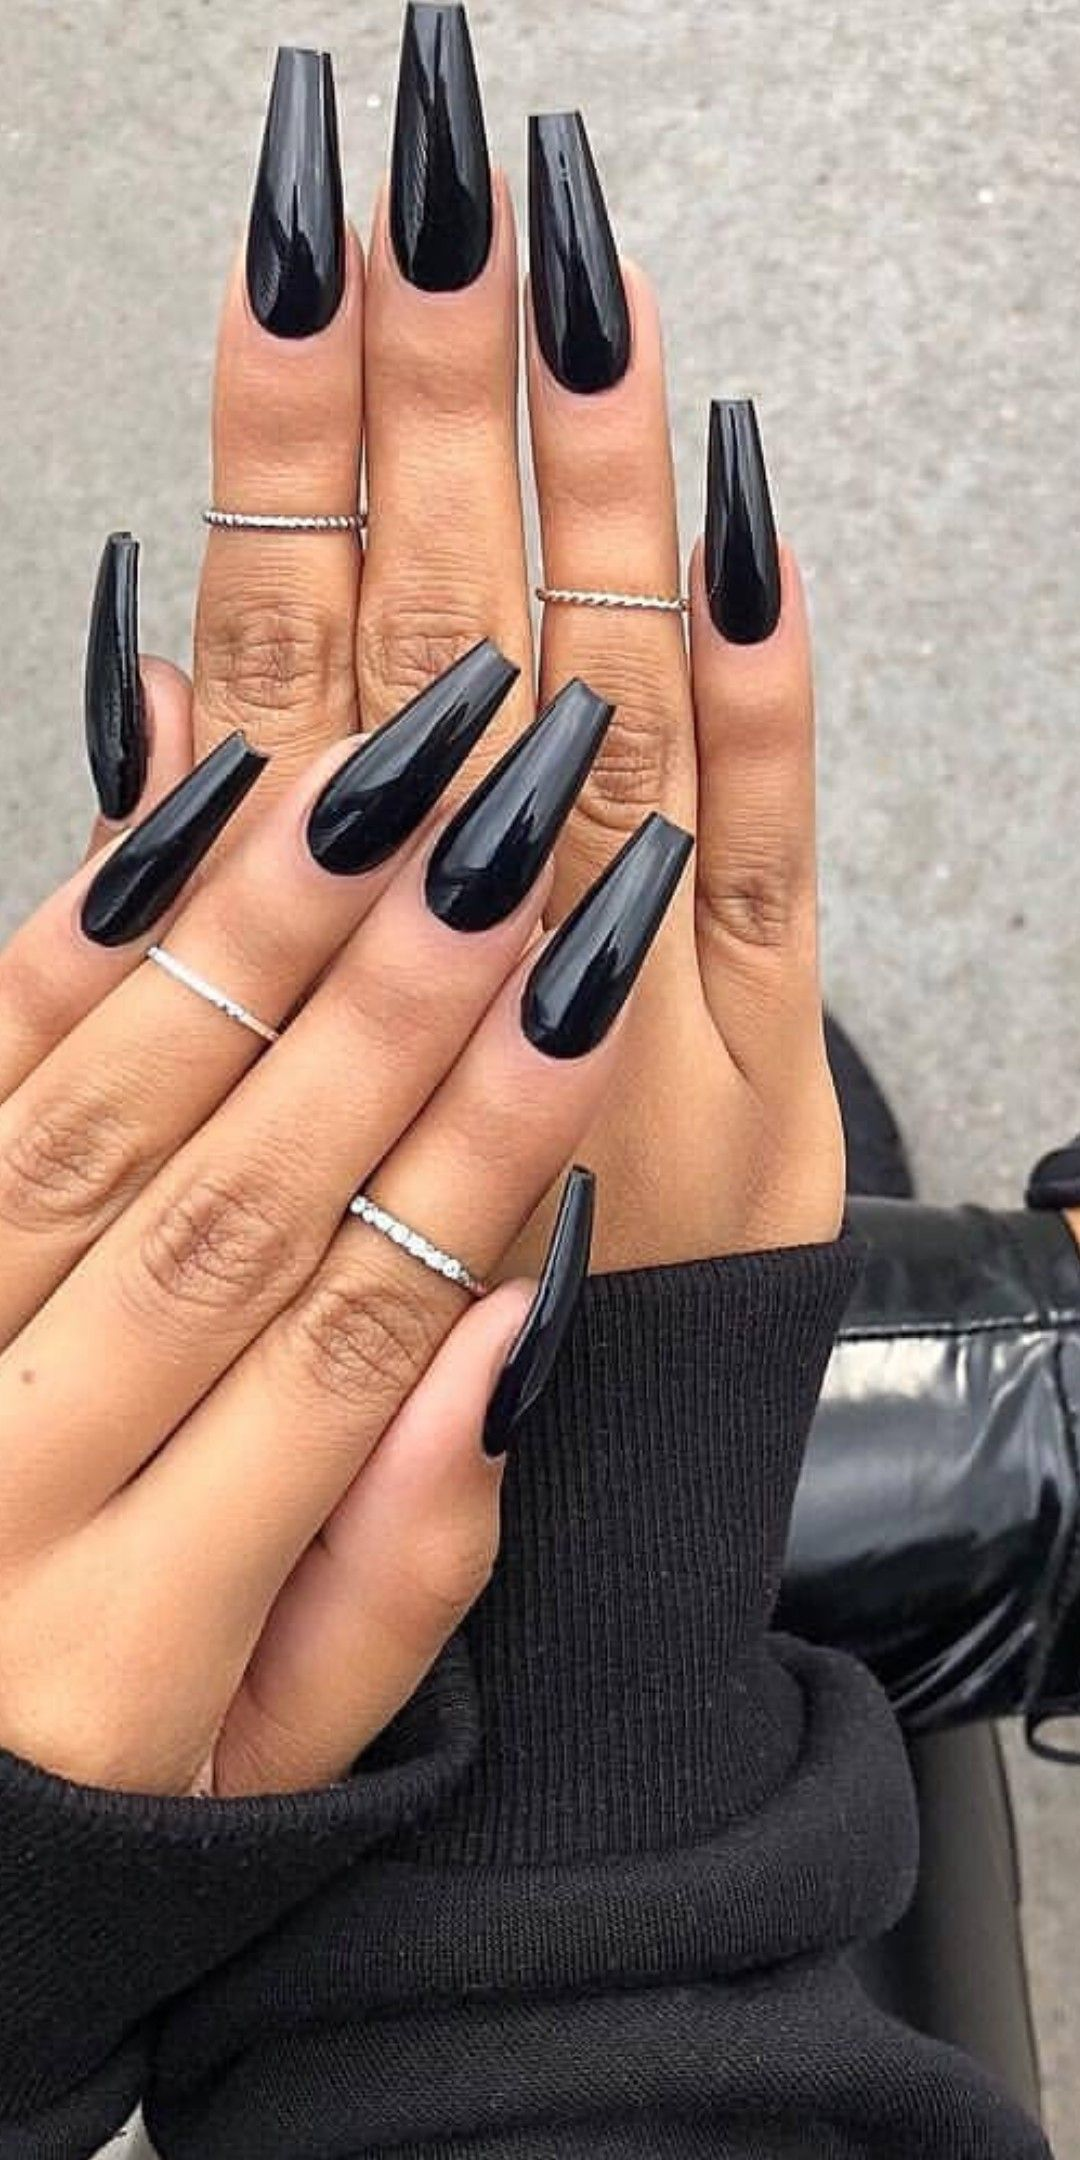 Pin By Arta Istrefii On Nails In 2020 Black Nails Black Acrylic Nails